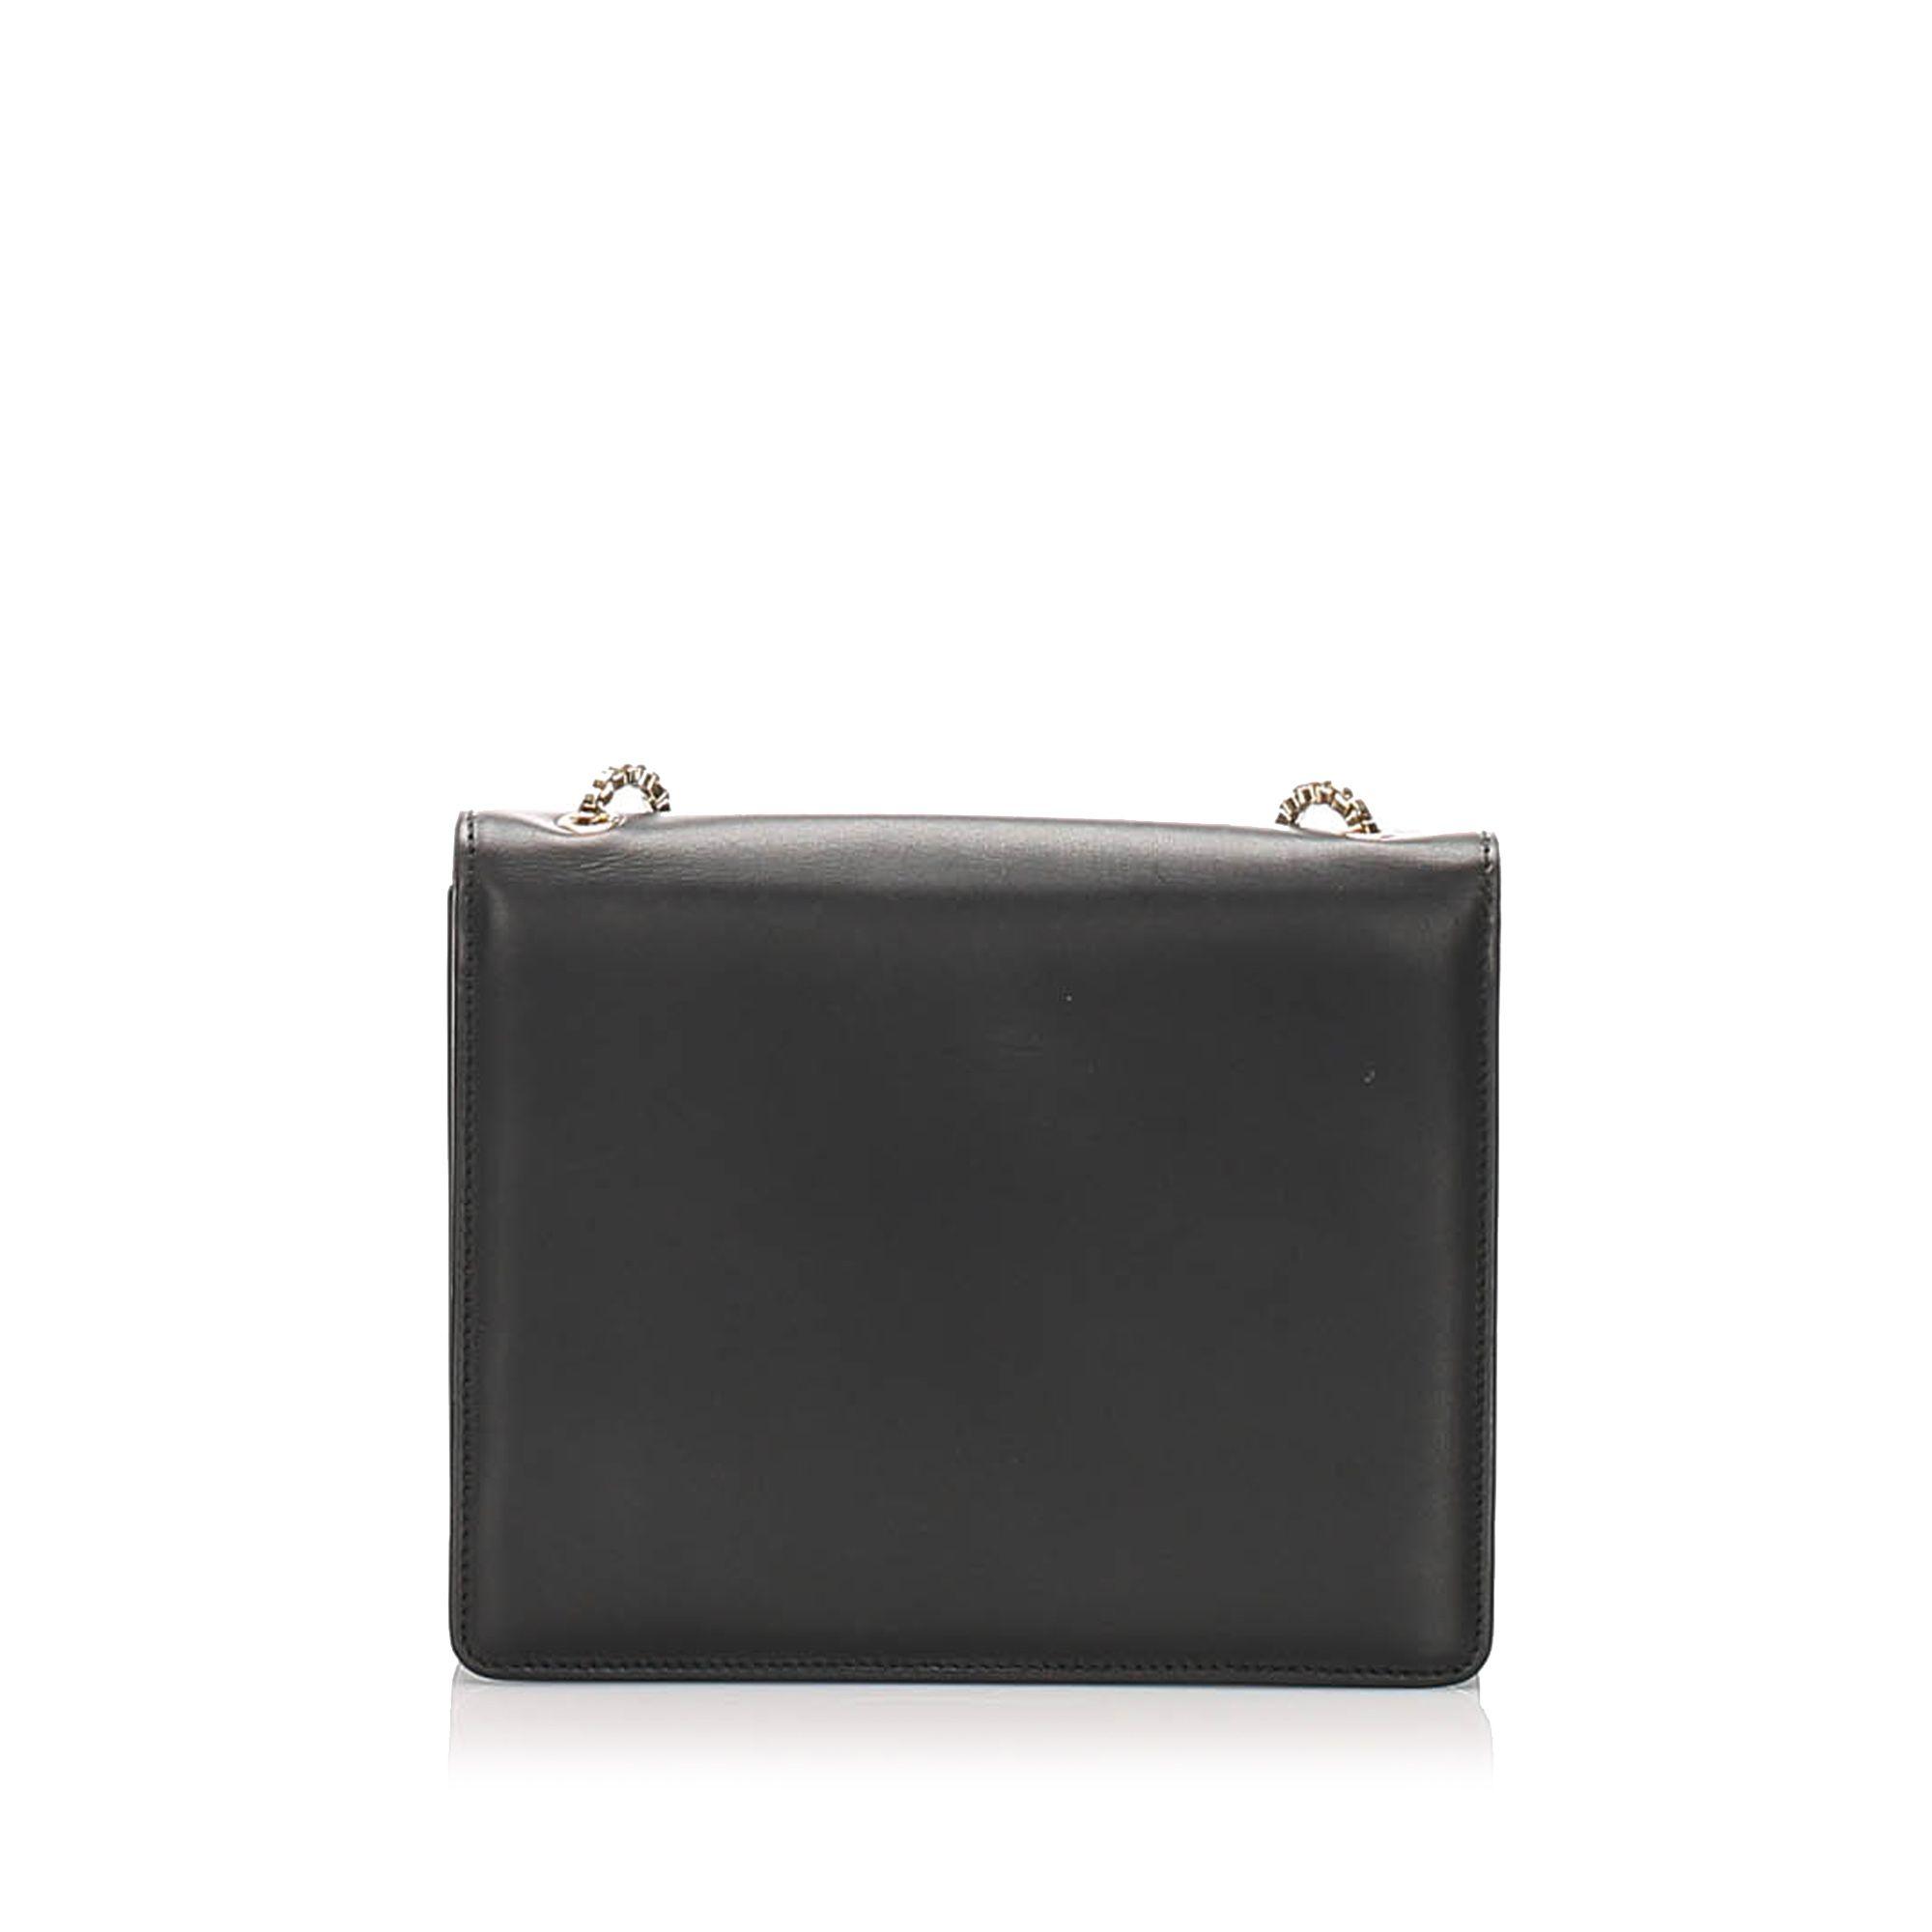 Vintage Ferragamo Thalia Leather Crossbody Bag Black